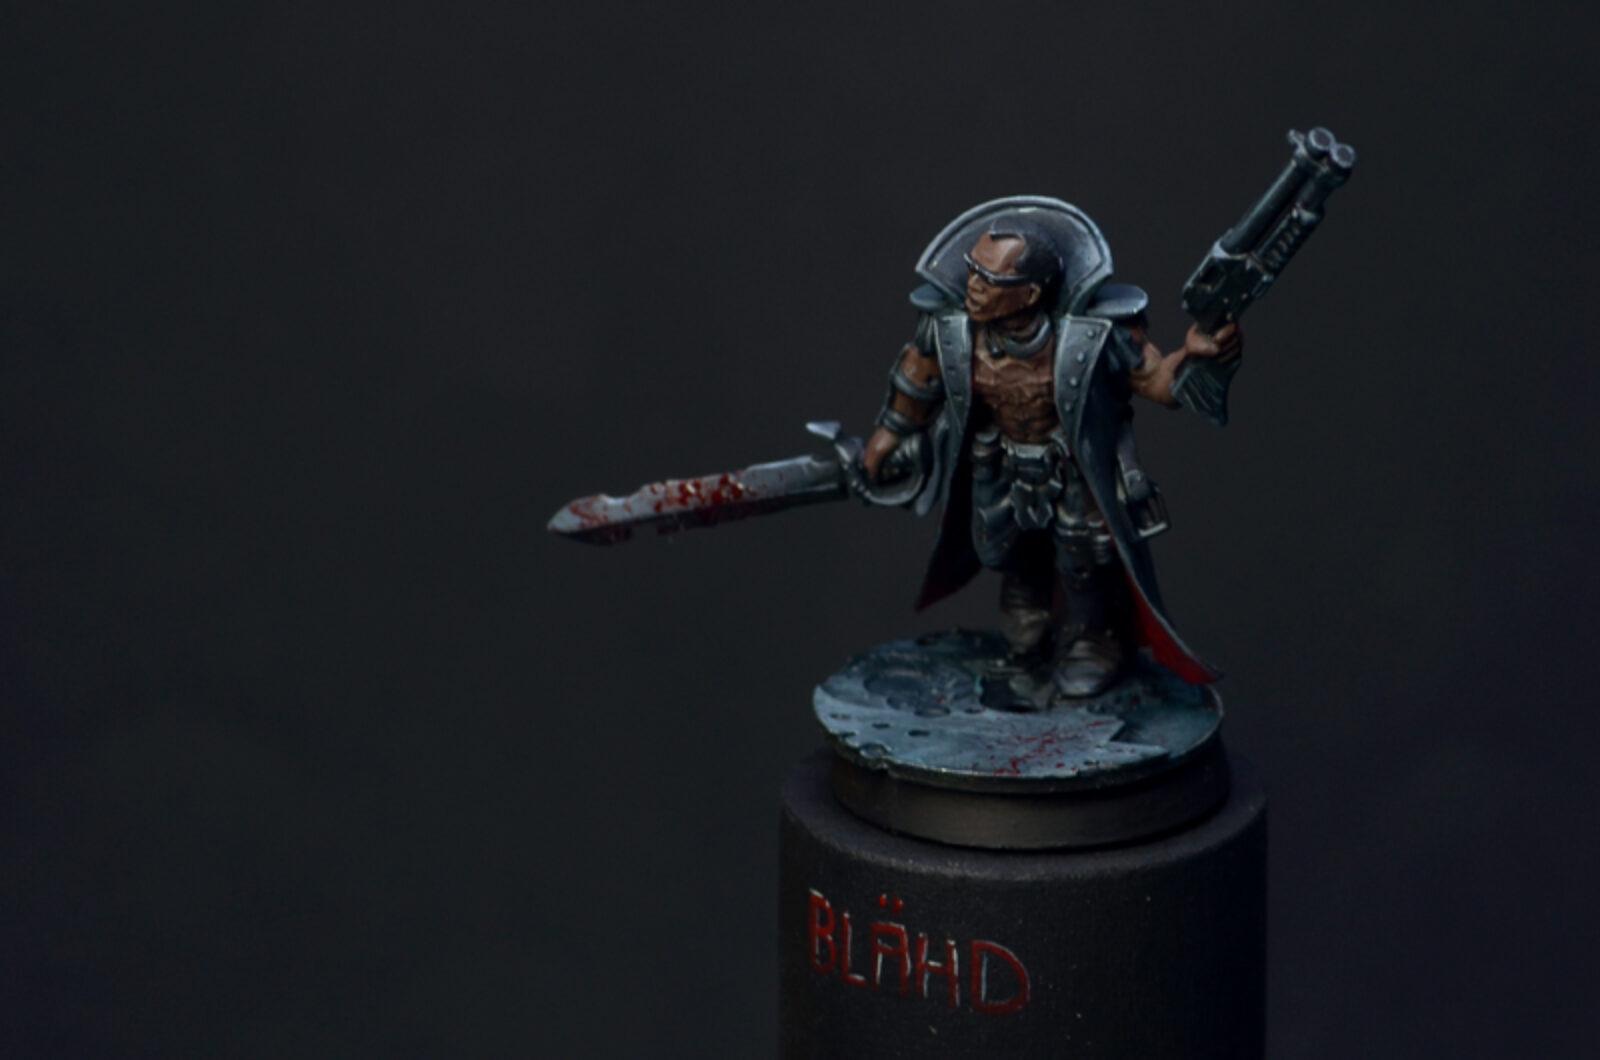 Blade02